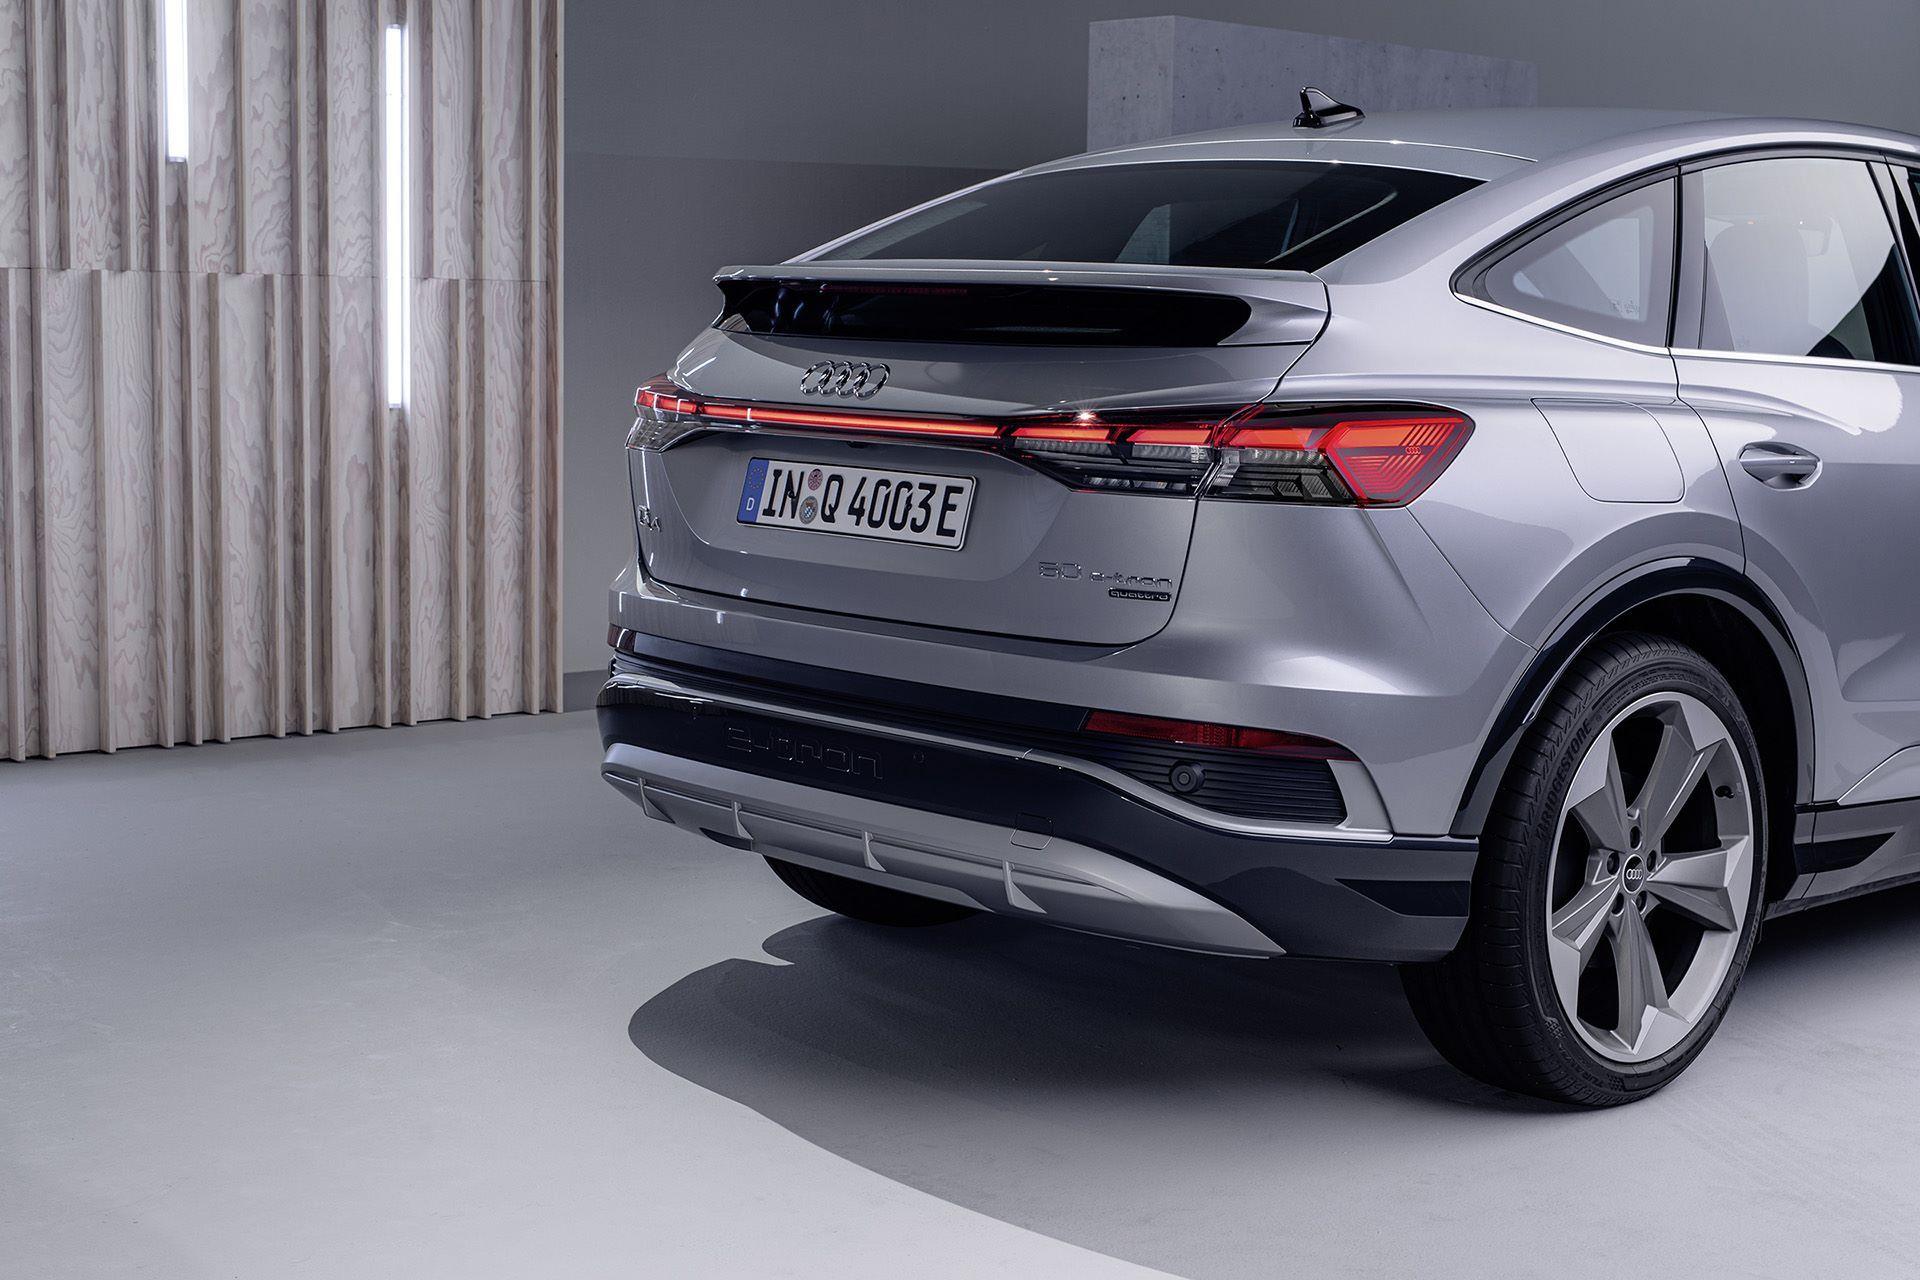 Audi-Q4-e-tron-and-Q4-e-tron-Sportback-29